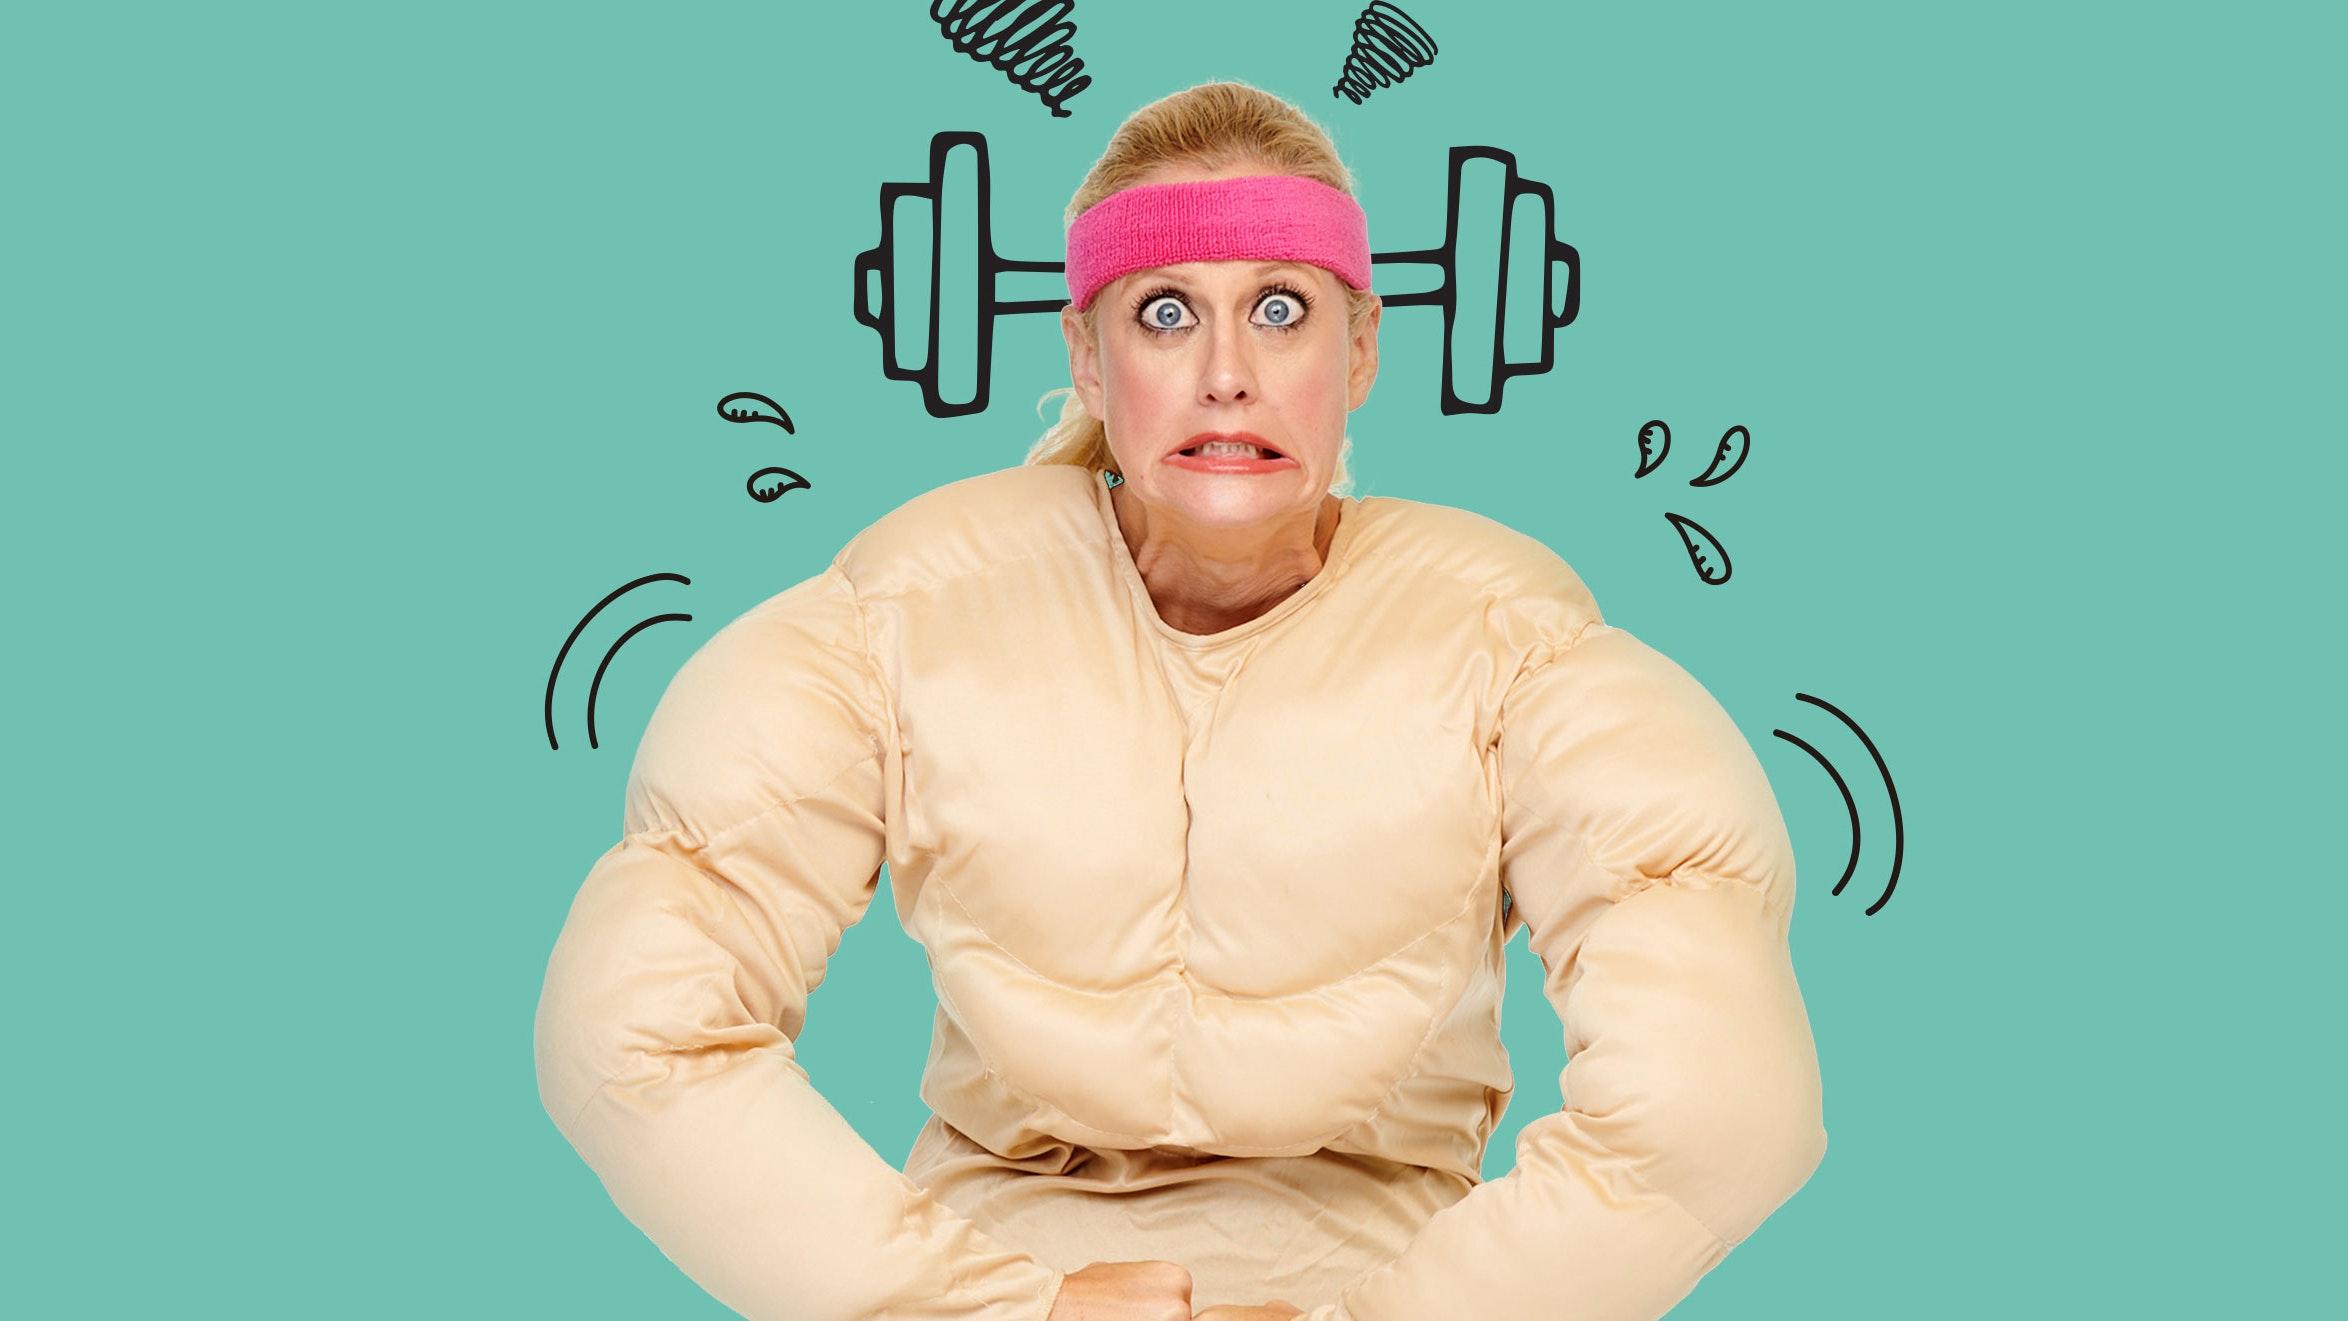 barba radio - Ich hasse Sport